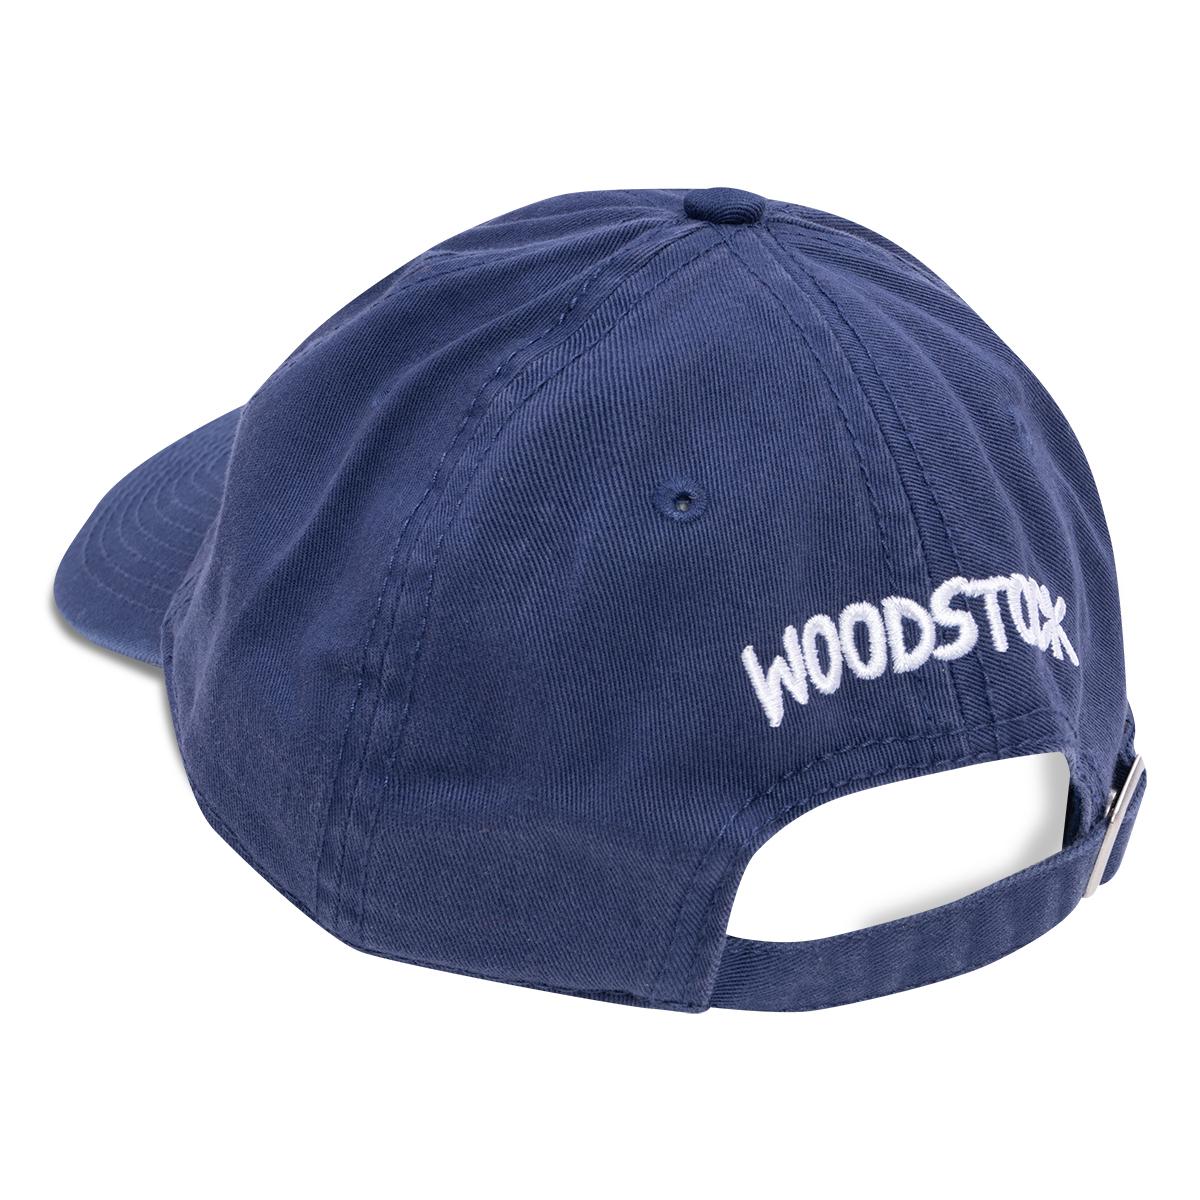 Woodstock 50th Anniversary Indigo Twill Cap